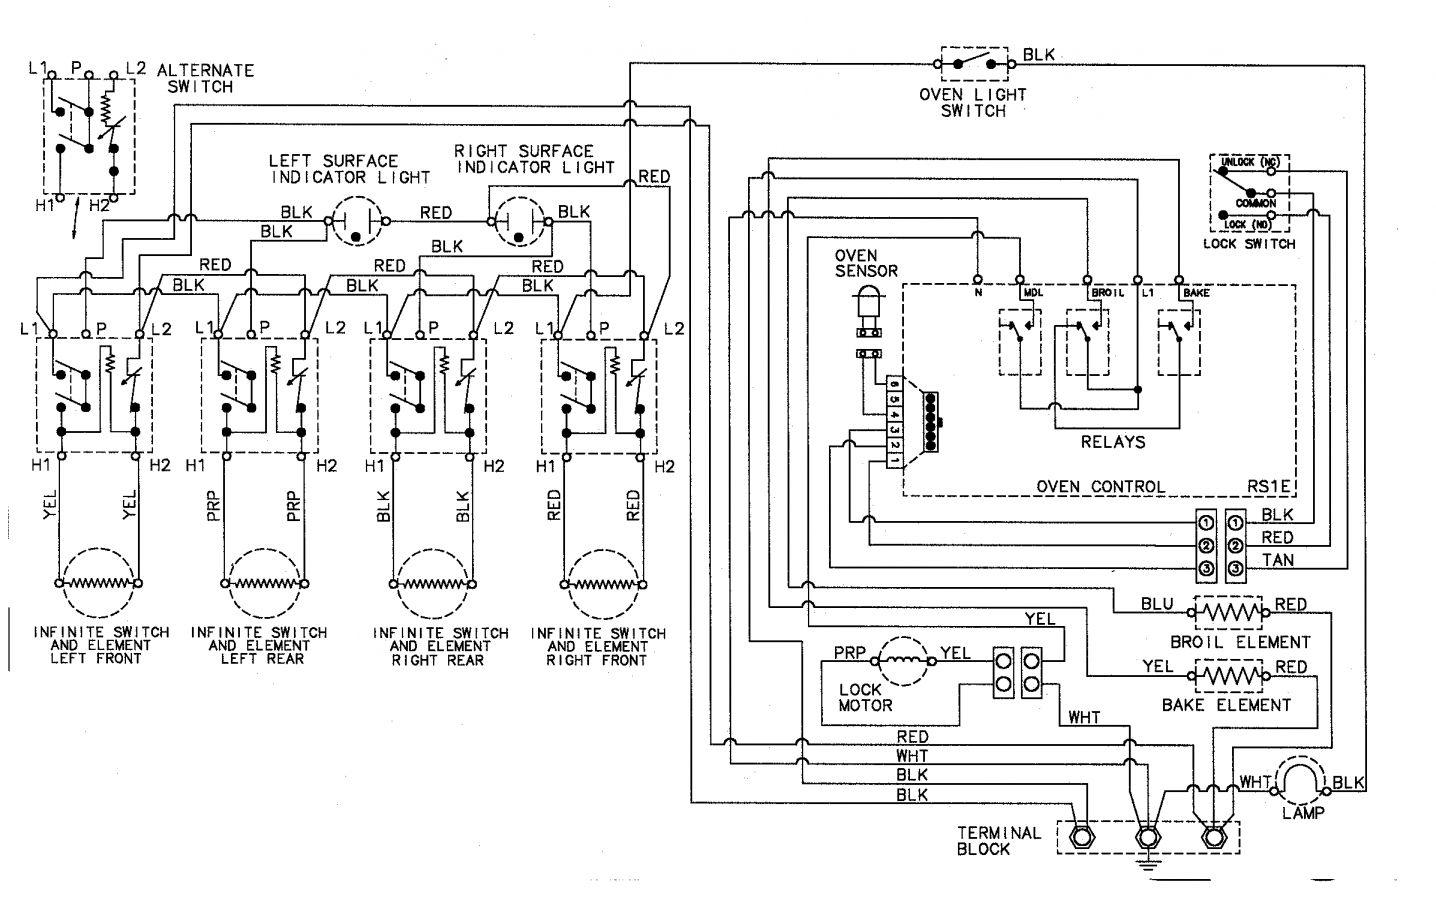 17 Frigidaire Electric Range Wiring Diagram Wiring Diagram Wiringg Net Electric Stove Electric Cooker Electric Range Oven